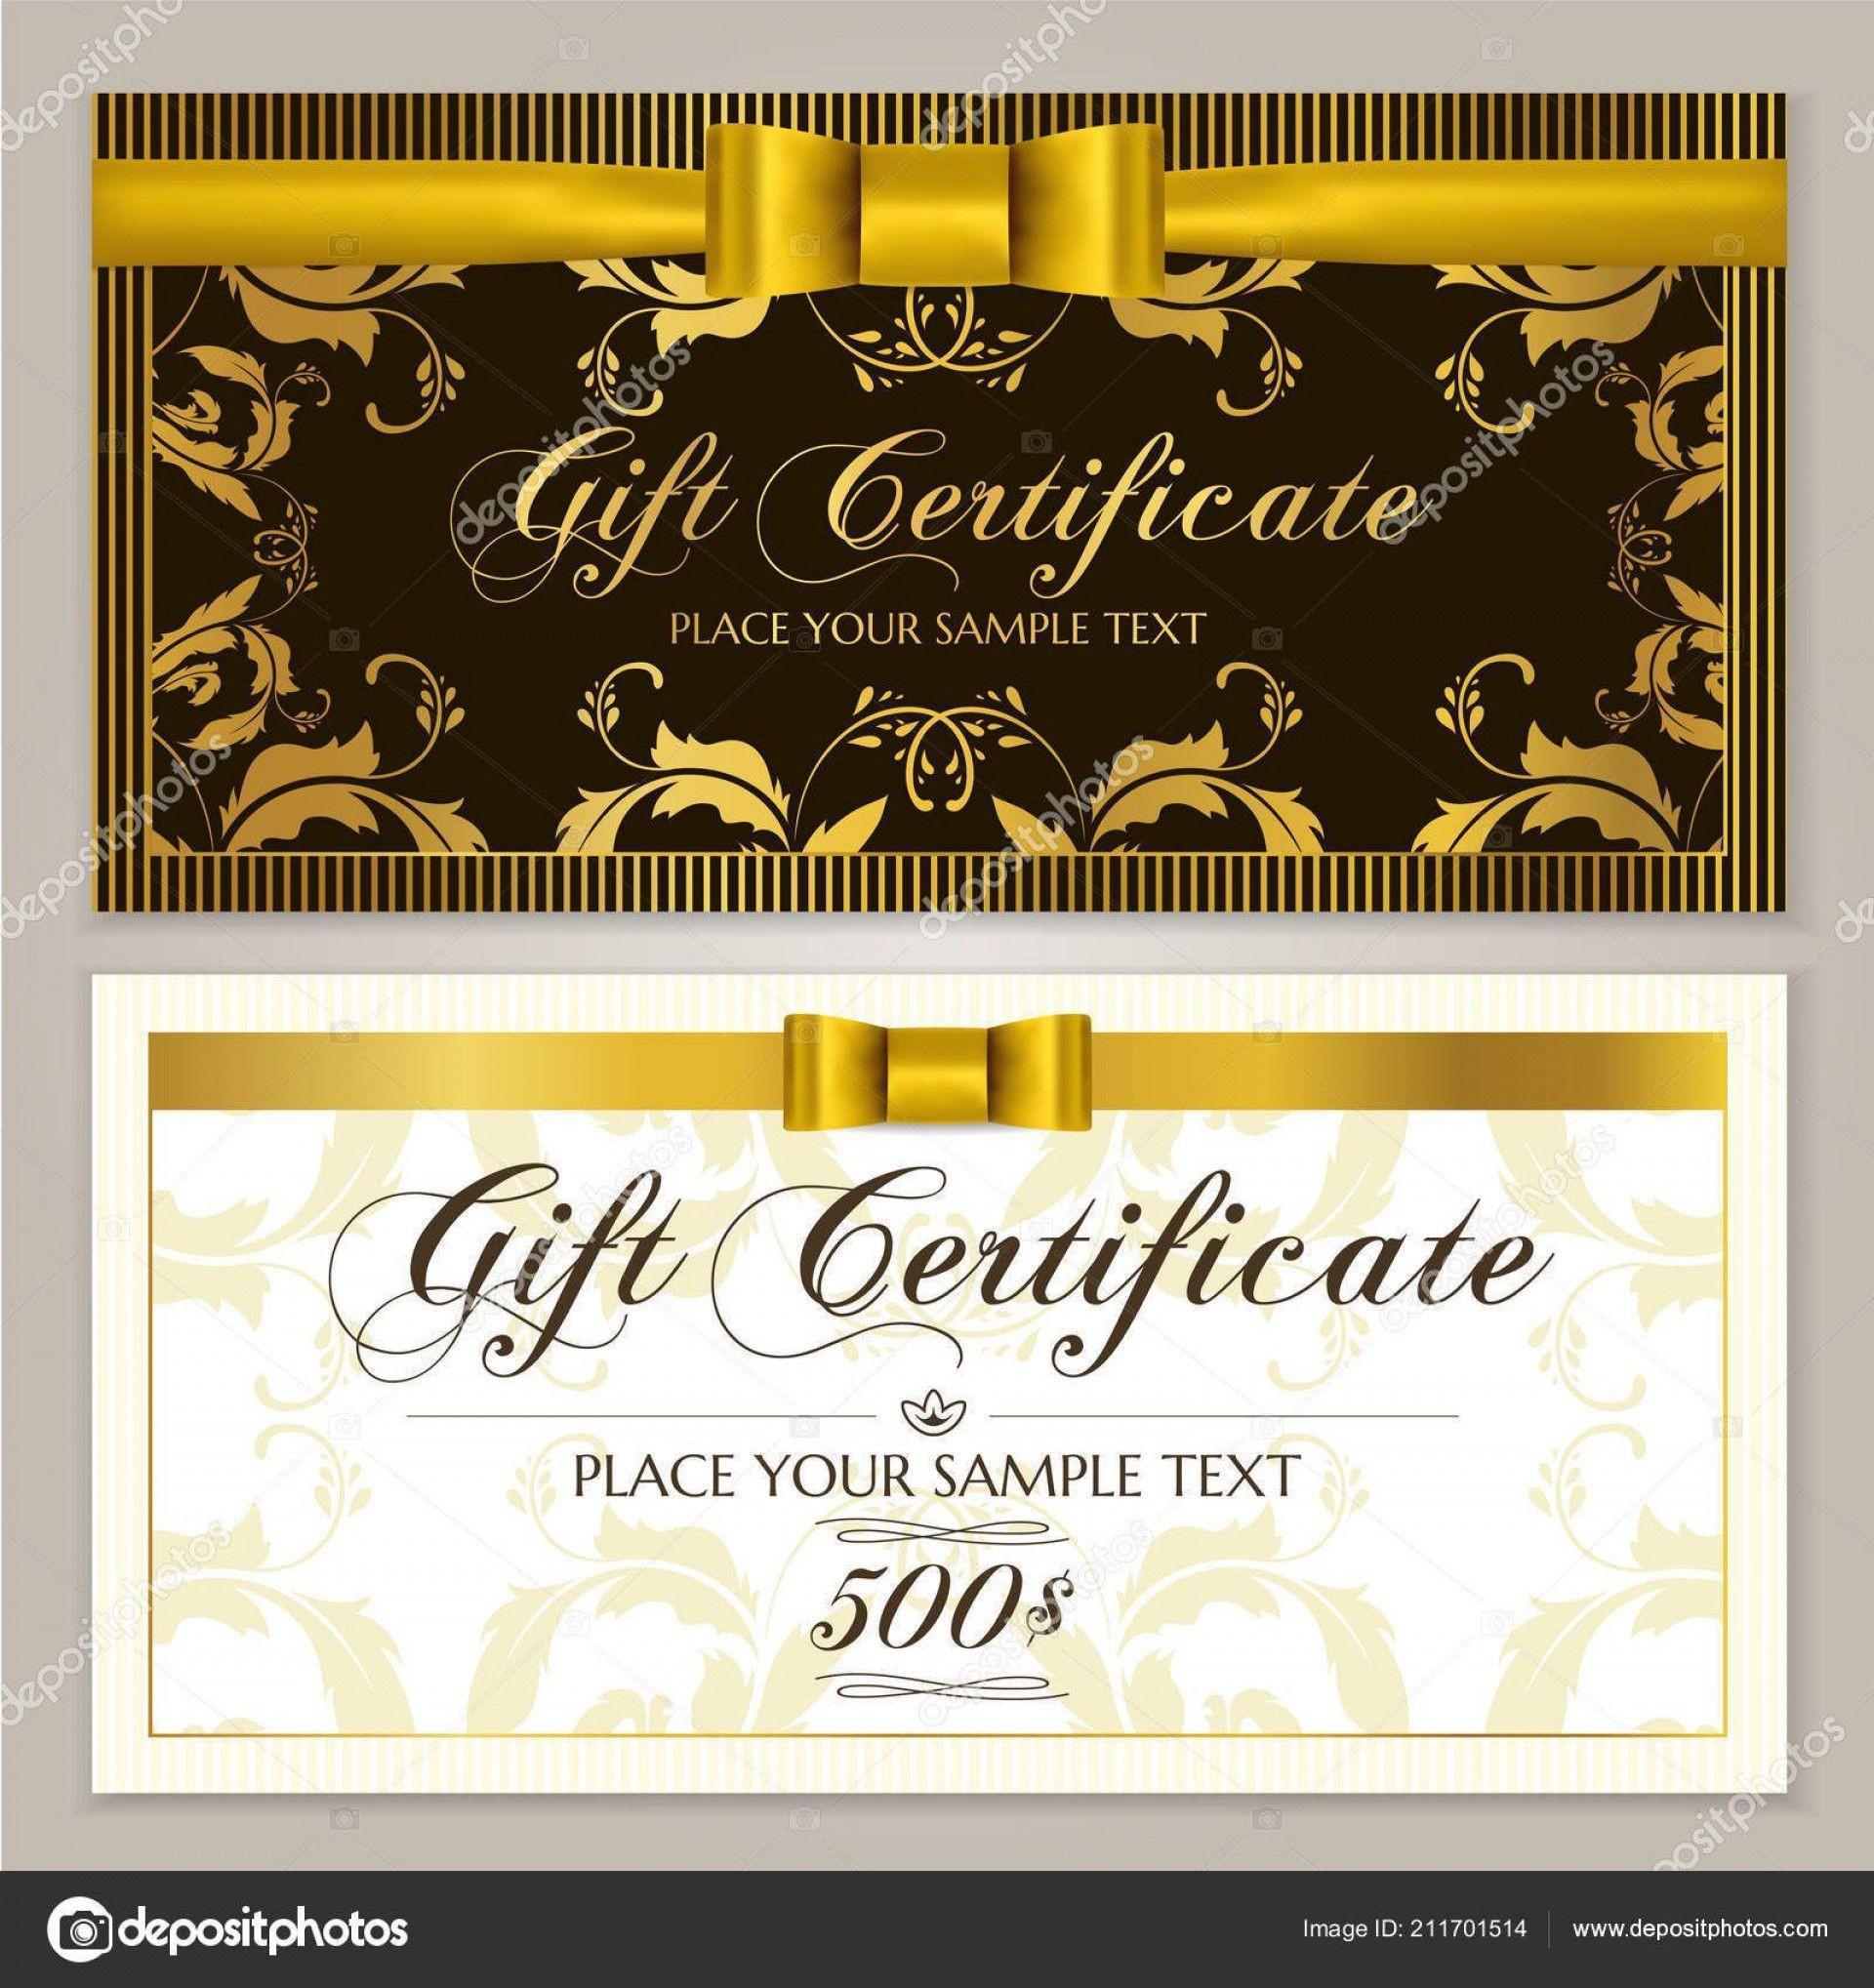 000 Unbelievable Restaurant Gift Certificate Template High Resolution  Templates Card Word Voucher Free1920